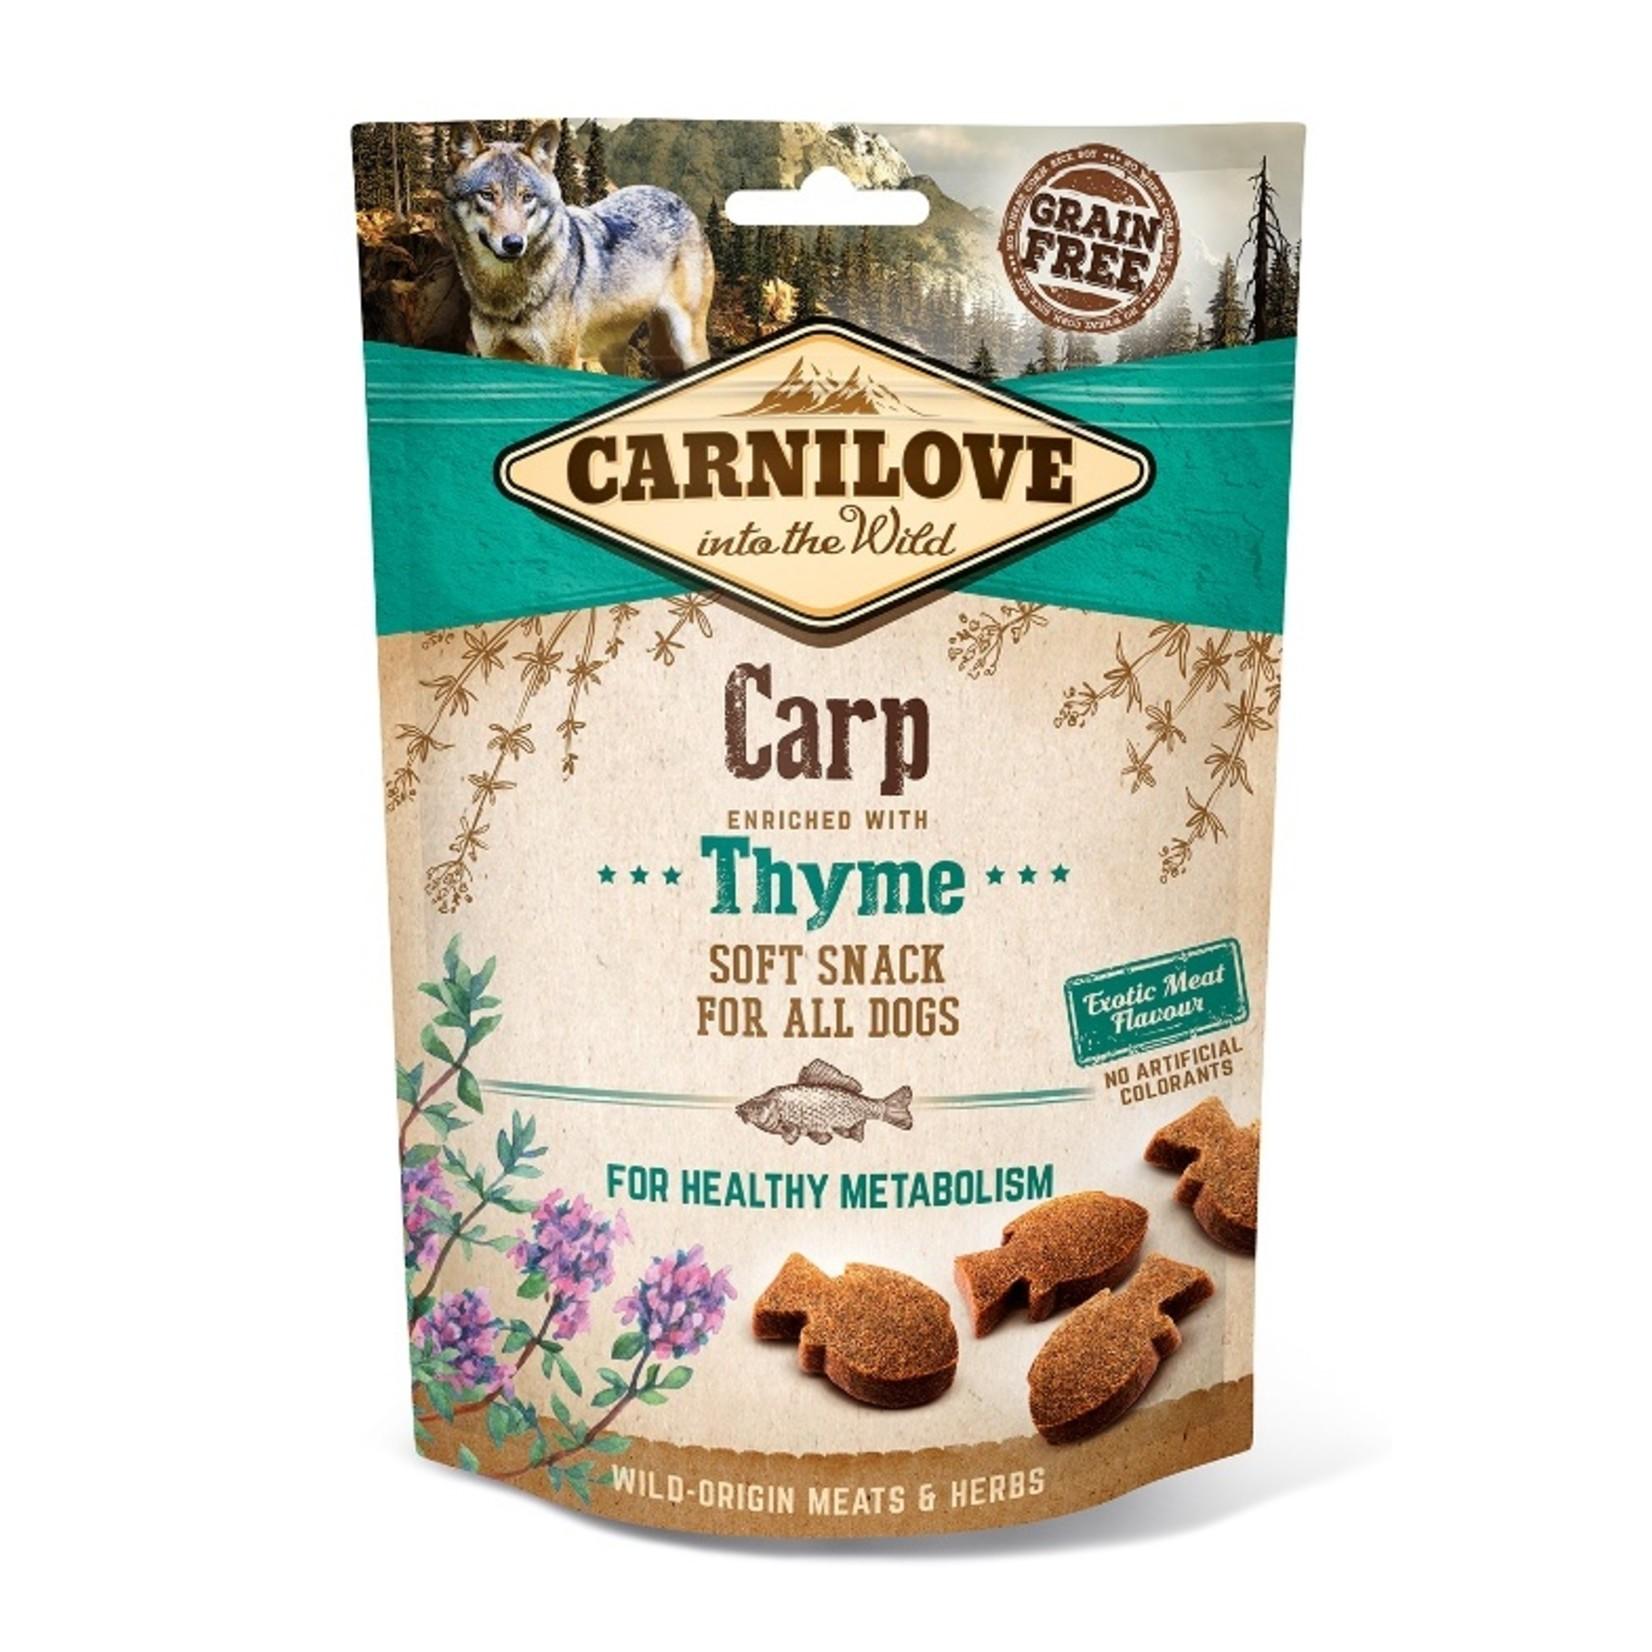 Carnilove Soft Snack Carp & Thyme